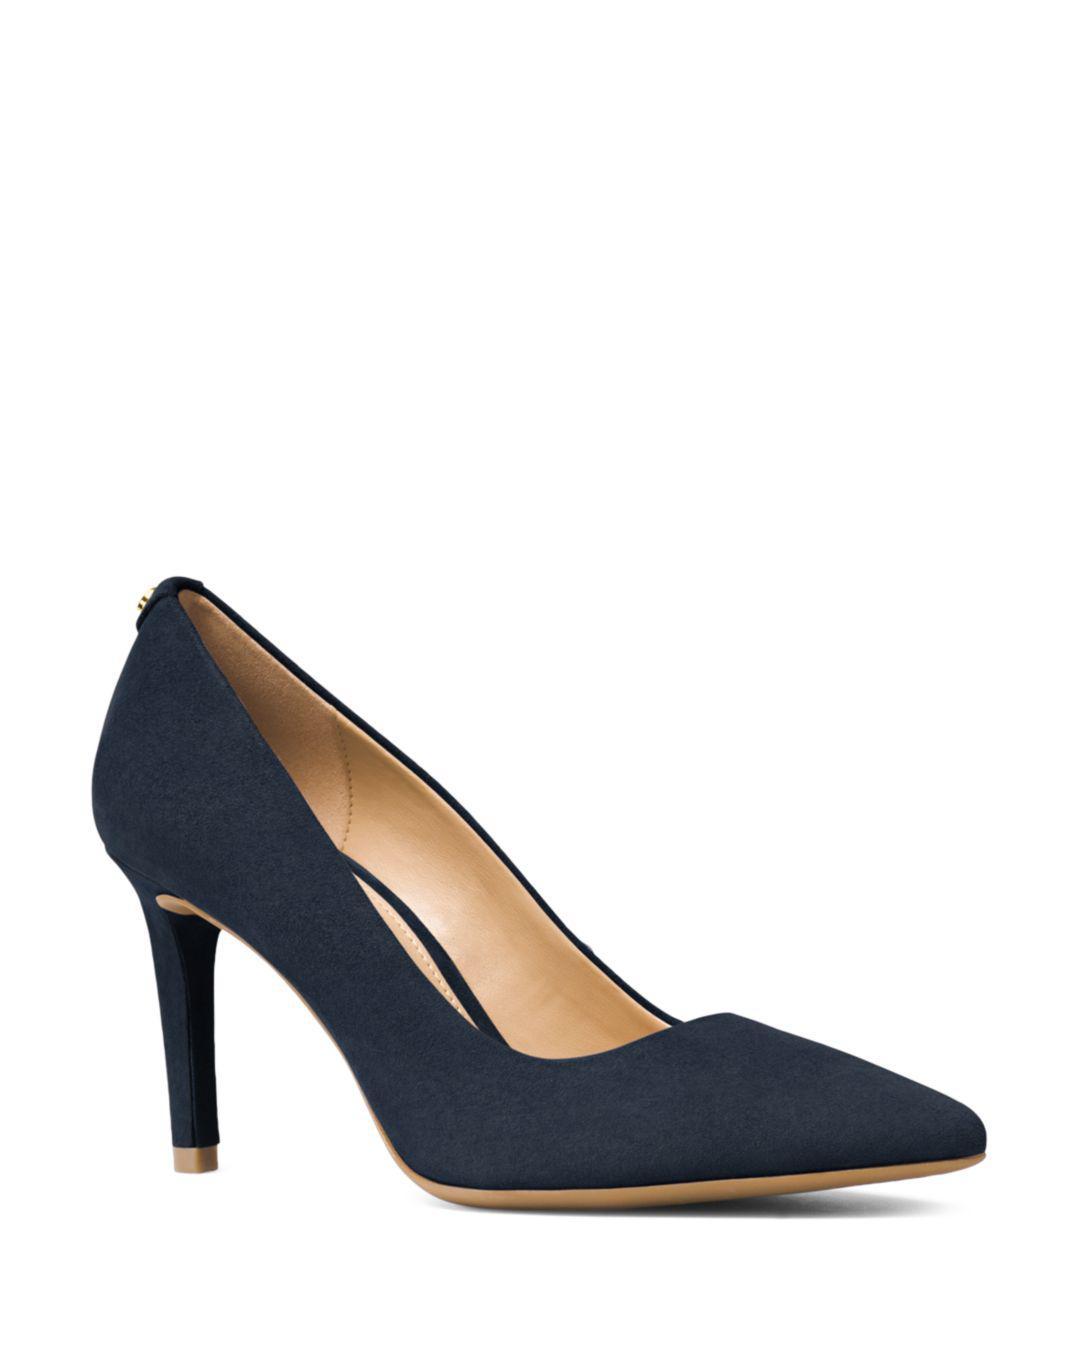 e91c1521a MICHAEL Michael Kors Dorothy Flex Suede Pointed Toe High-heel Pumps ...